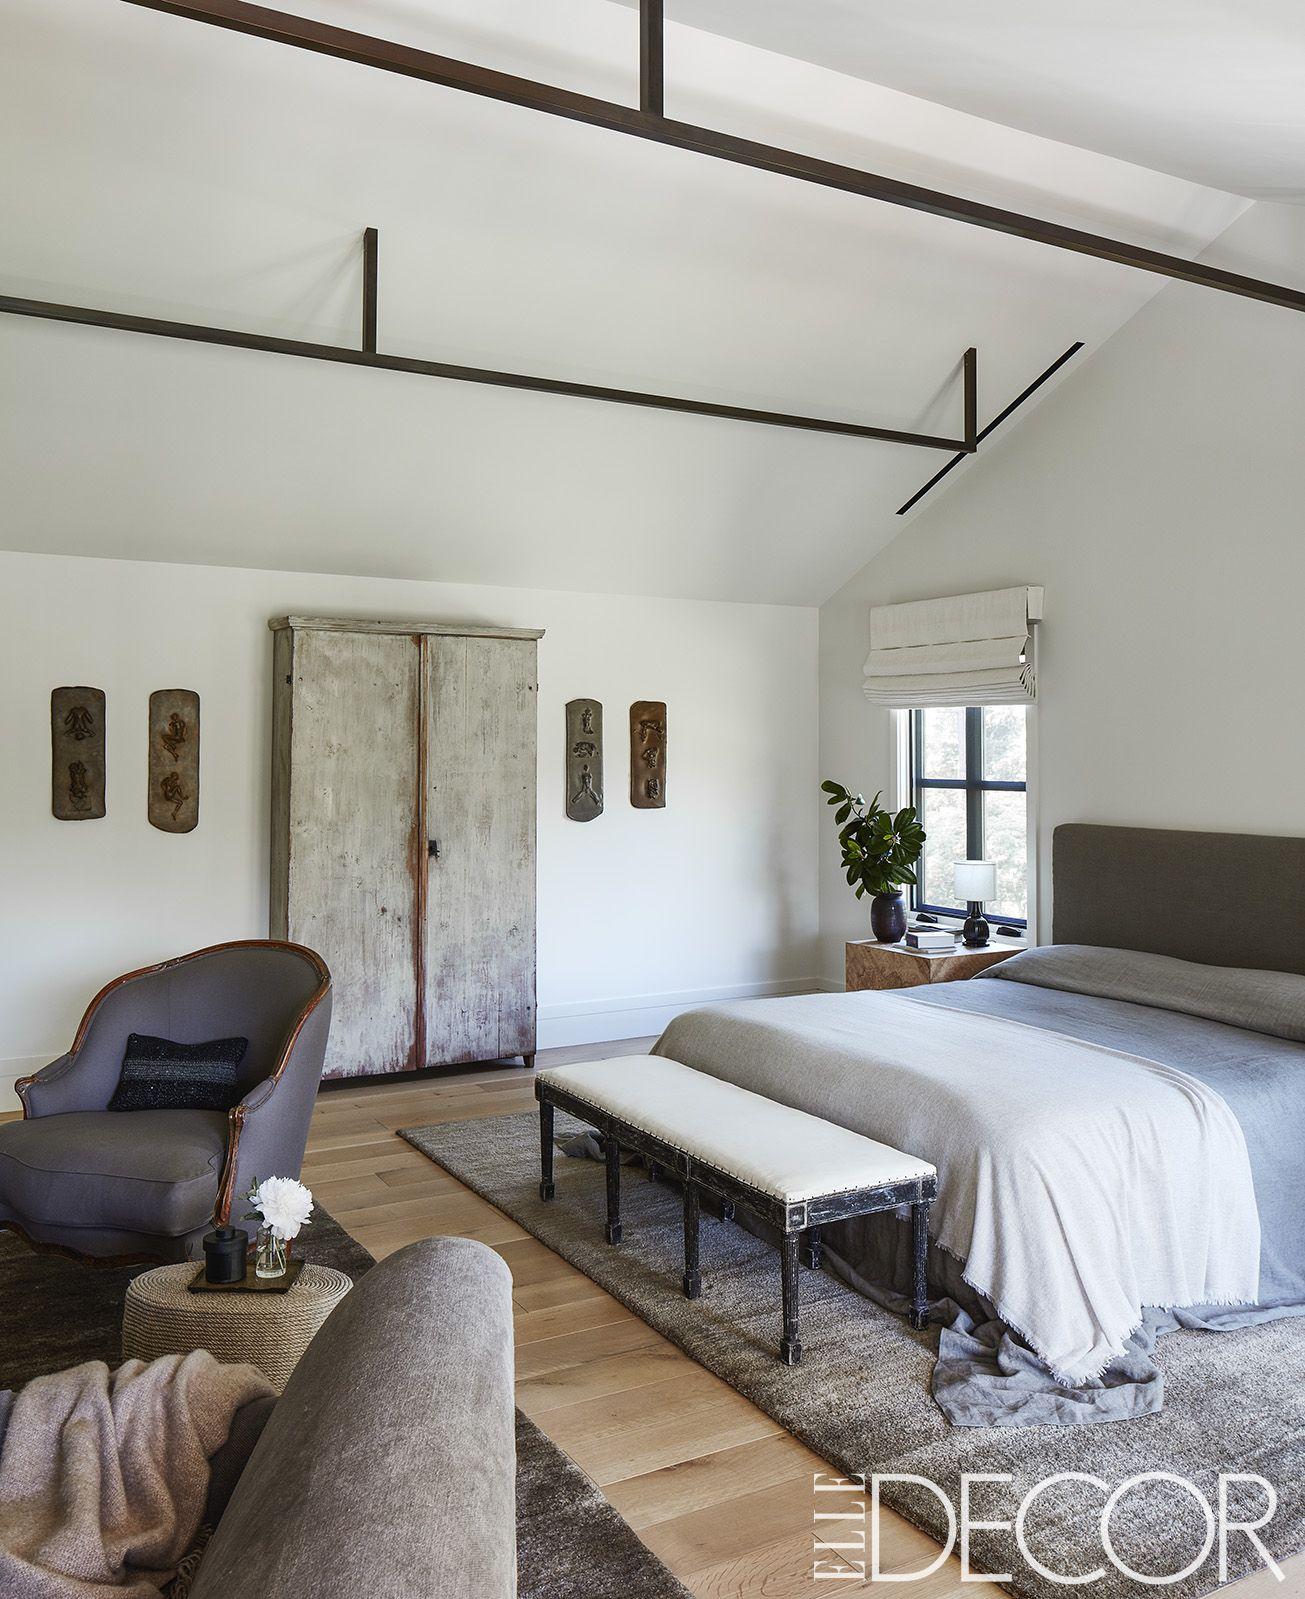 25 Minimalist Bedroom Decor Ideas - Modern Designs for ... on Bedroom Minimalist Design Ideas  id=72929